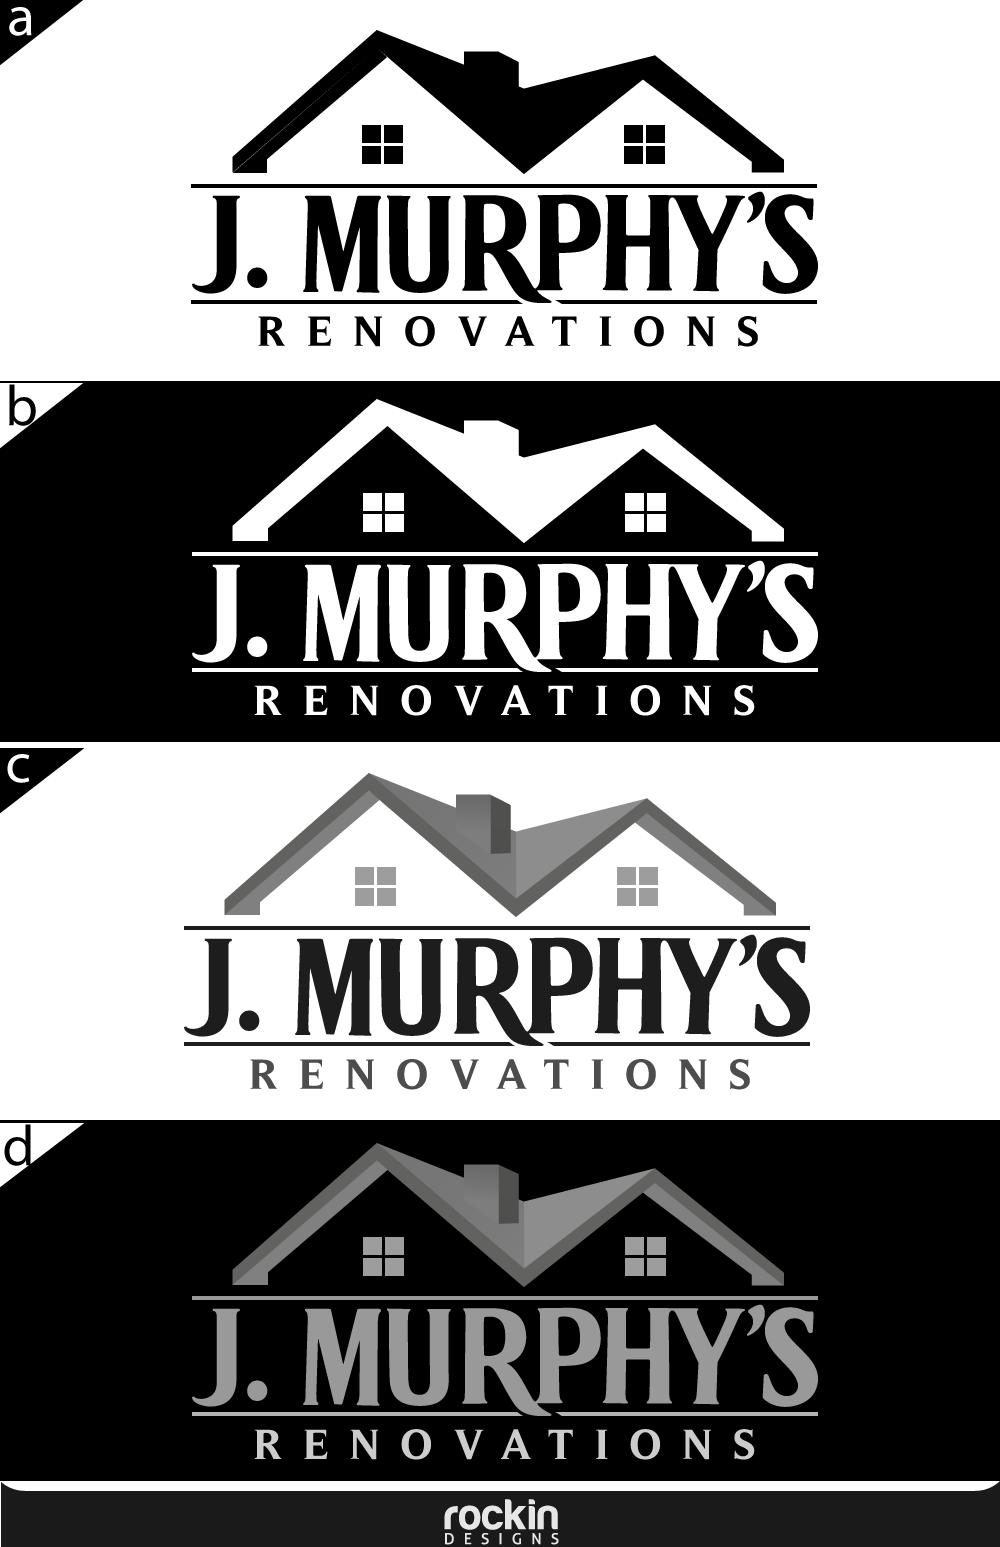 Logo Design by rockin - Entry No. 103 in the Logo Design Contest J. Murphy's Renovations Logo Design.